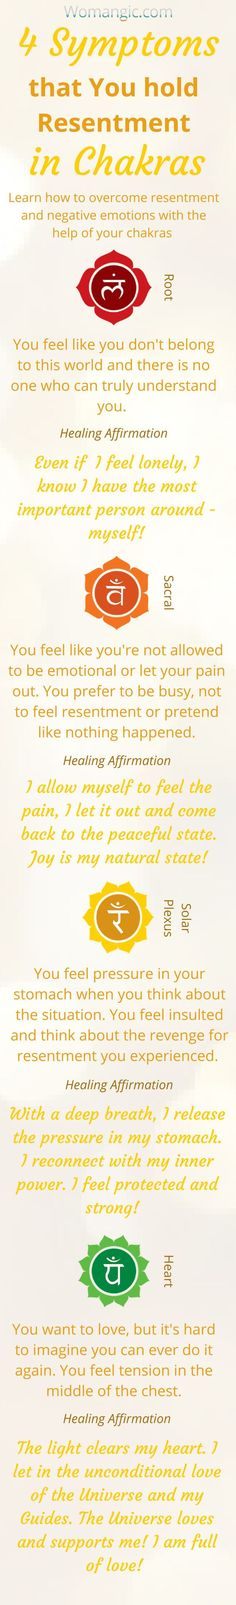 How to Use Chakra Healing to Transform Your Life Chakra Heilung, Chakra Mantra, Crown Chakra, Power Of Meditation, Chakra Meditation, Mindfulness Meditation, Chakra Balancing, 7 Chakras, Relationship Problems